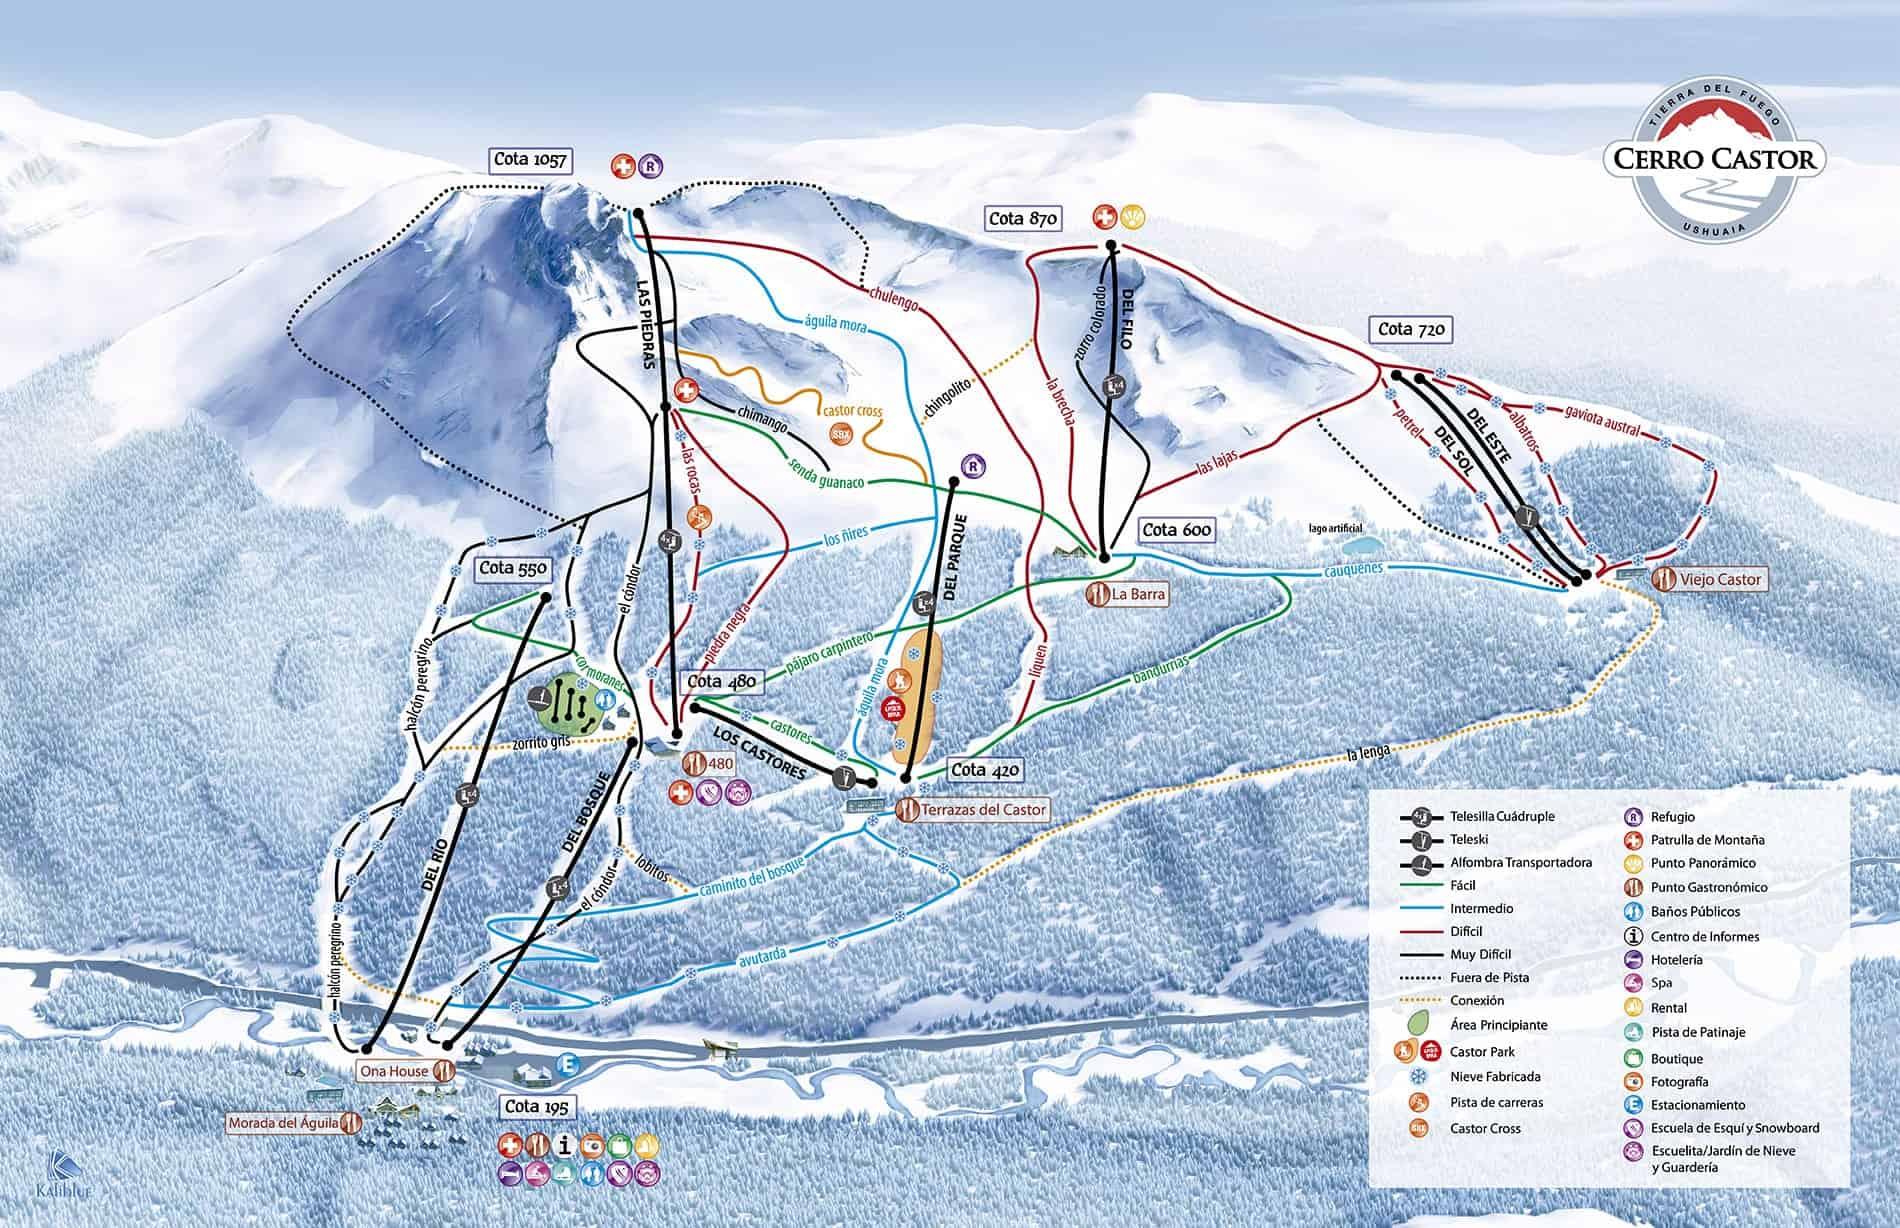 Cerro Castor pistekort.